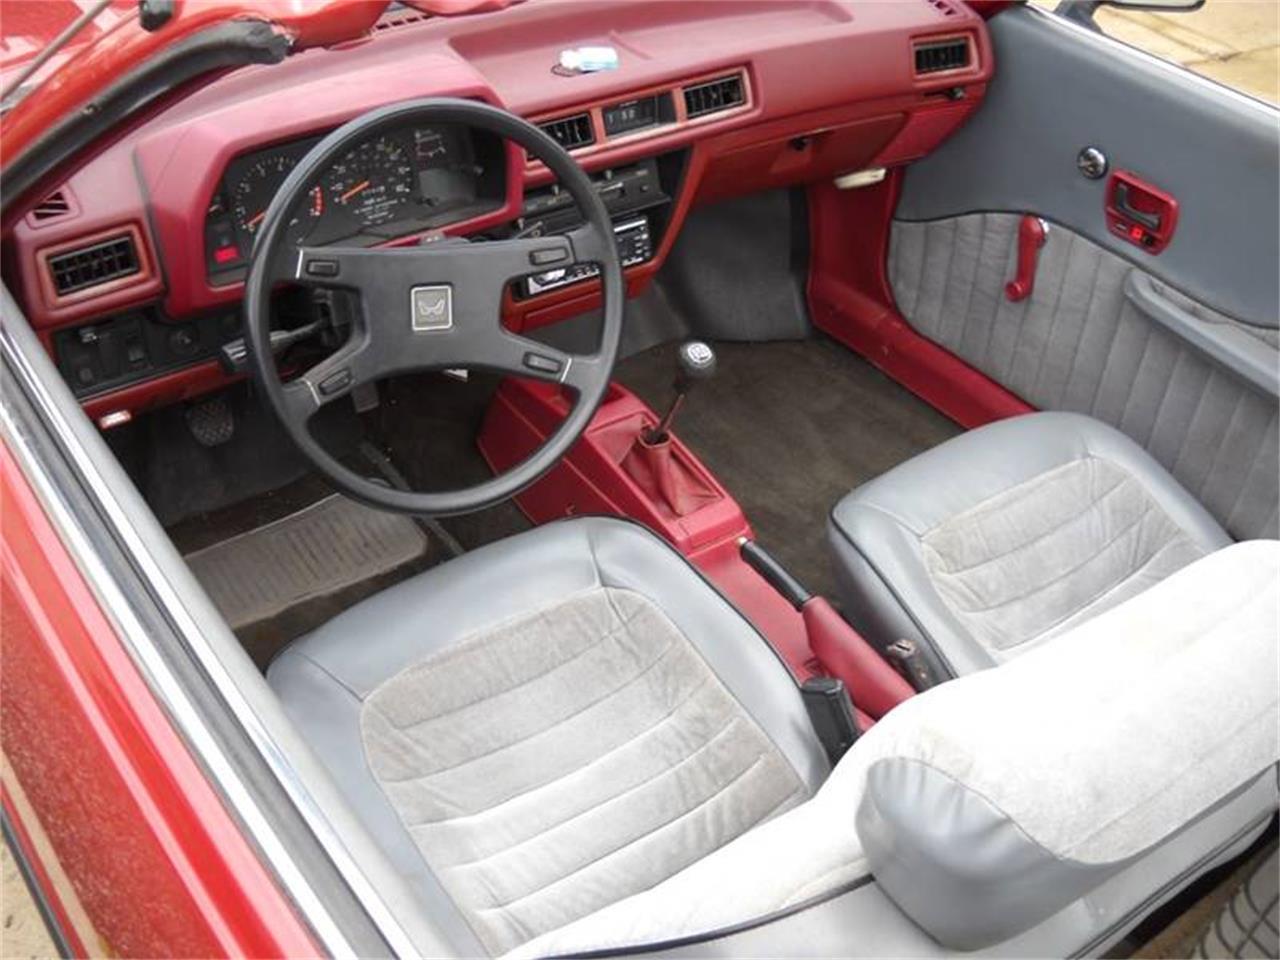 1981 Honda Prelude, 1981 Honda Prelude convertible is rare, indeed, ClassicCars.com Journal